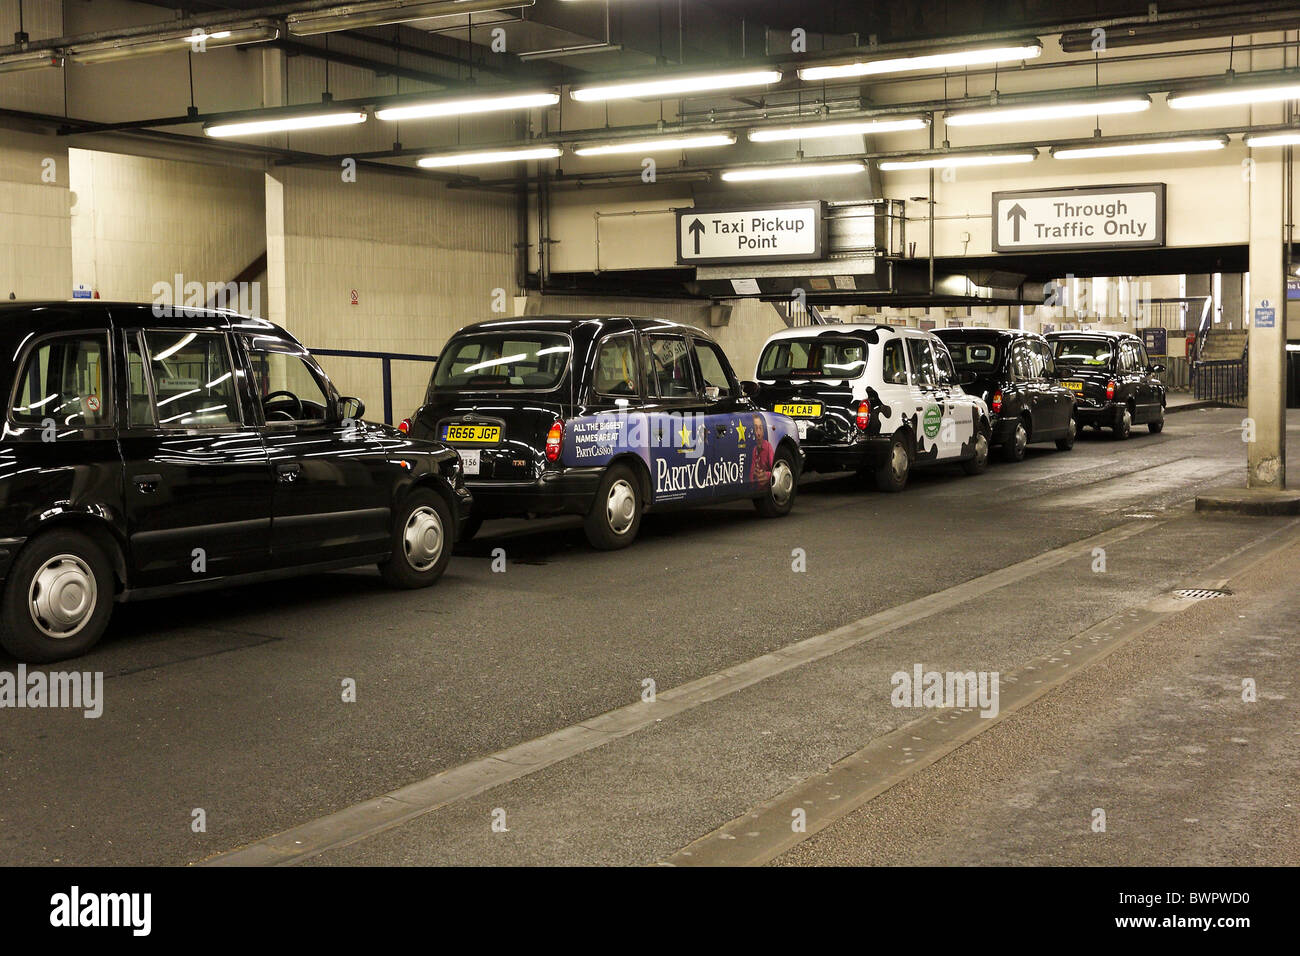 black cabs taxi rank stockfotos black cabs taxi rank bilder alamy. Black Bedroom Furniture Sets. Home Design Ideas